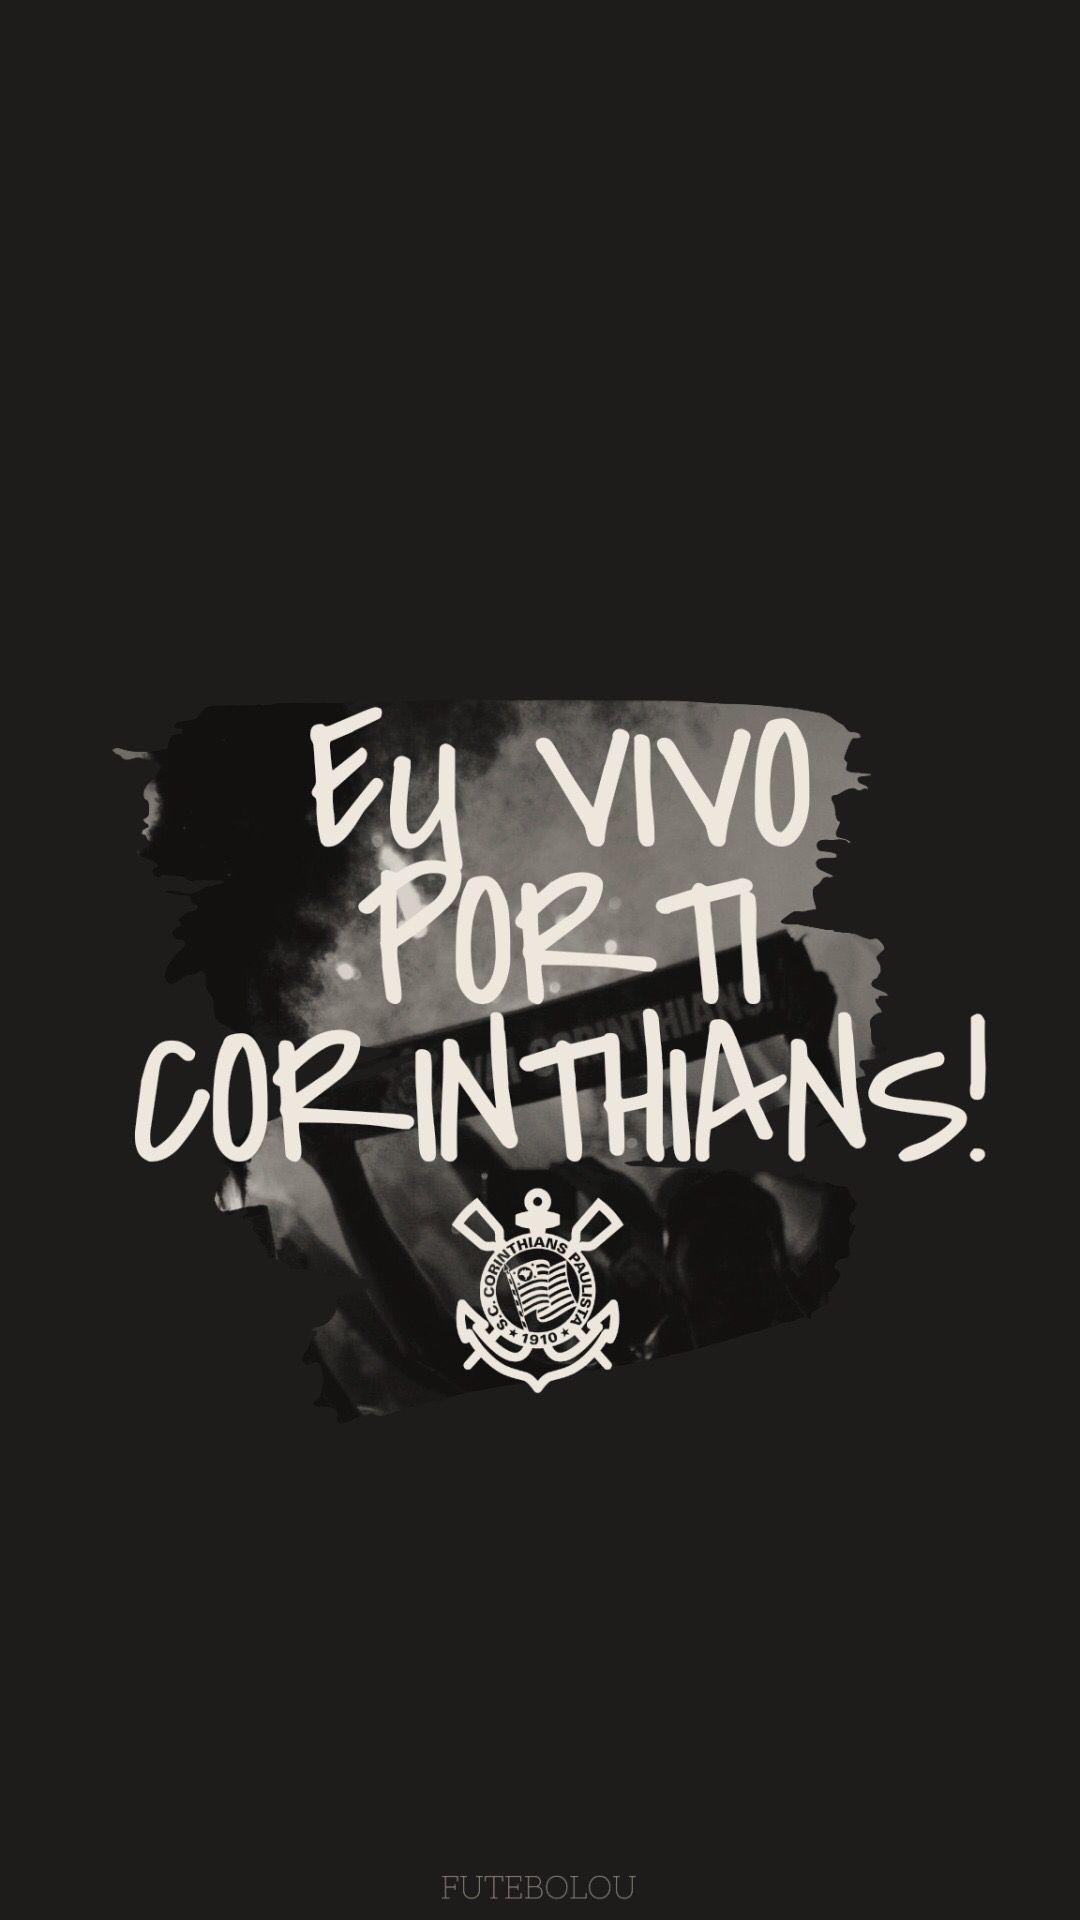 Pin De Gilson Gonzaga Jayme Em Corinthians Fotos Do Corinthians